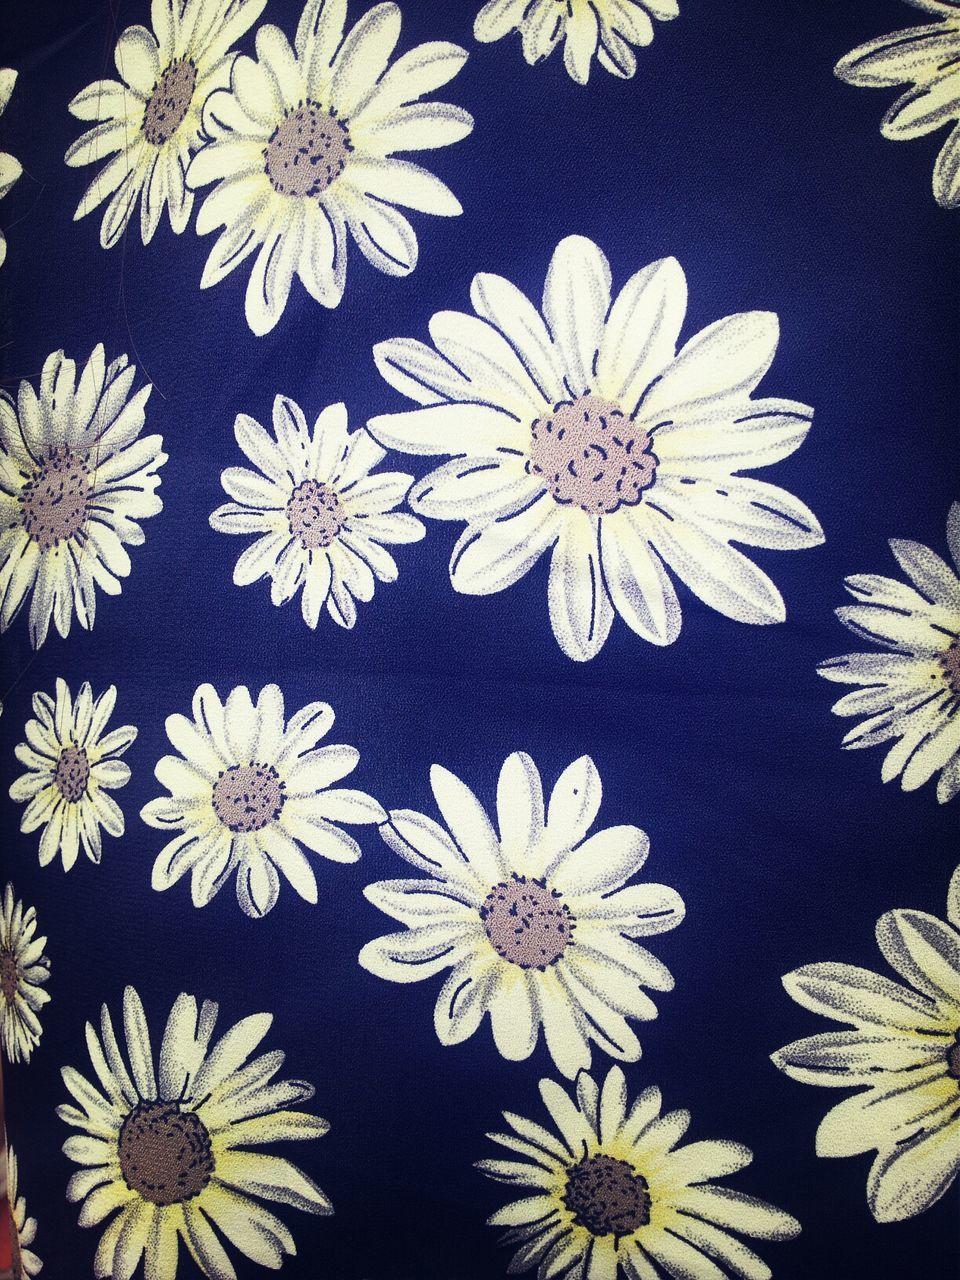 Full Frame Shot Of Flowers Printed On Textile